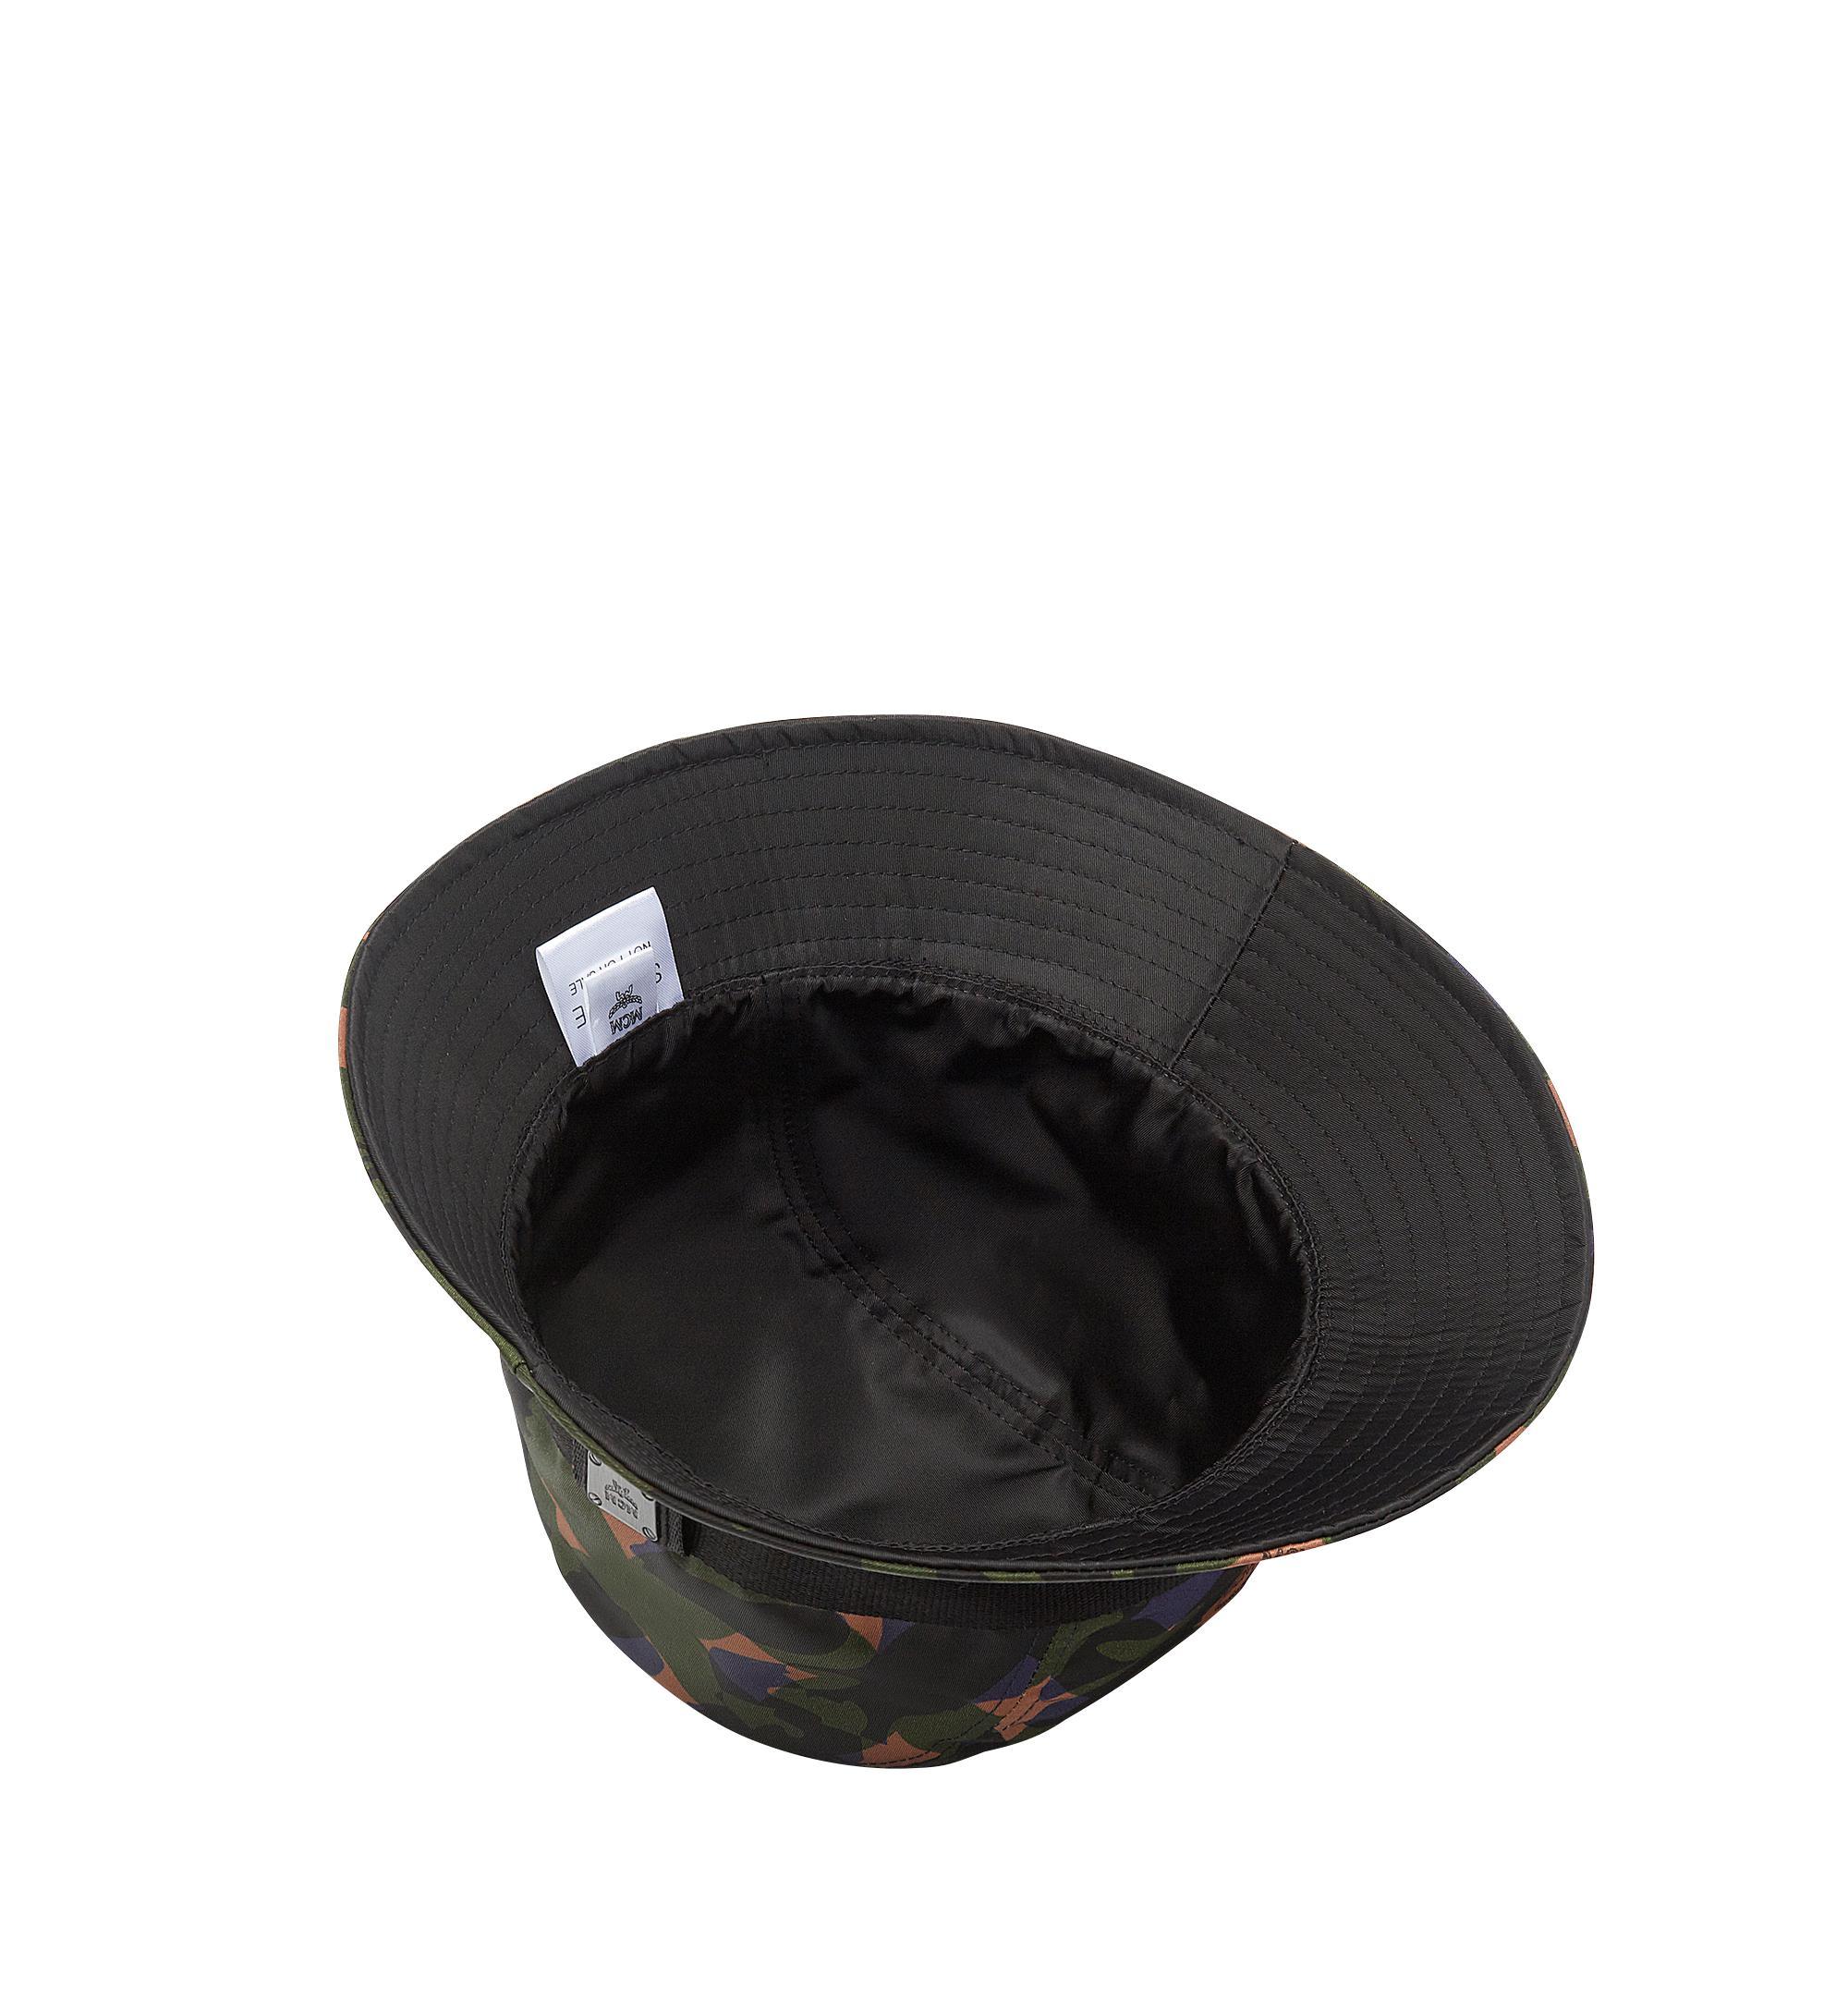 6c8f28b5af652 uk lyst mcm bucket hat in camo nylon in green 042c4 e7795